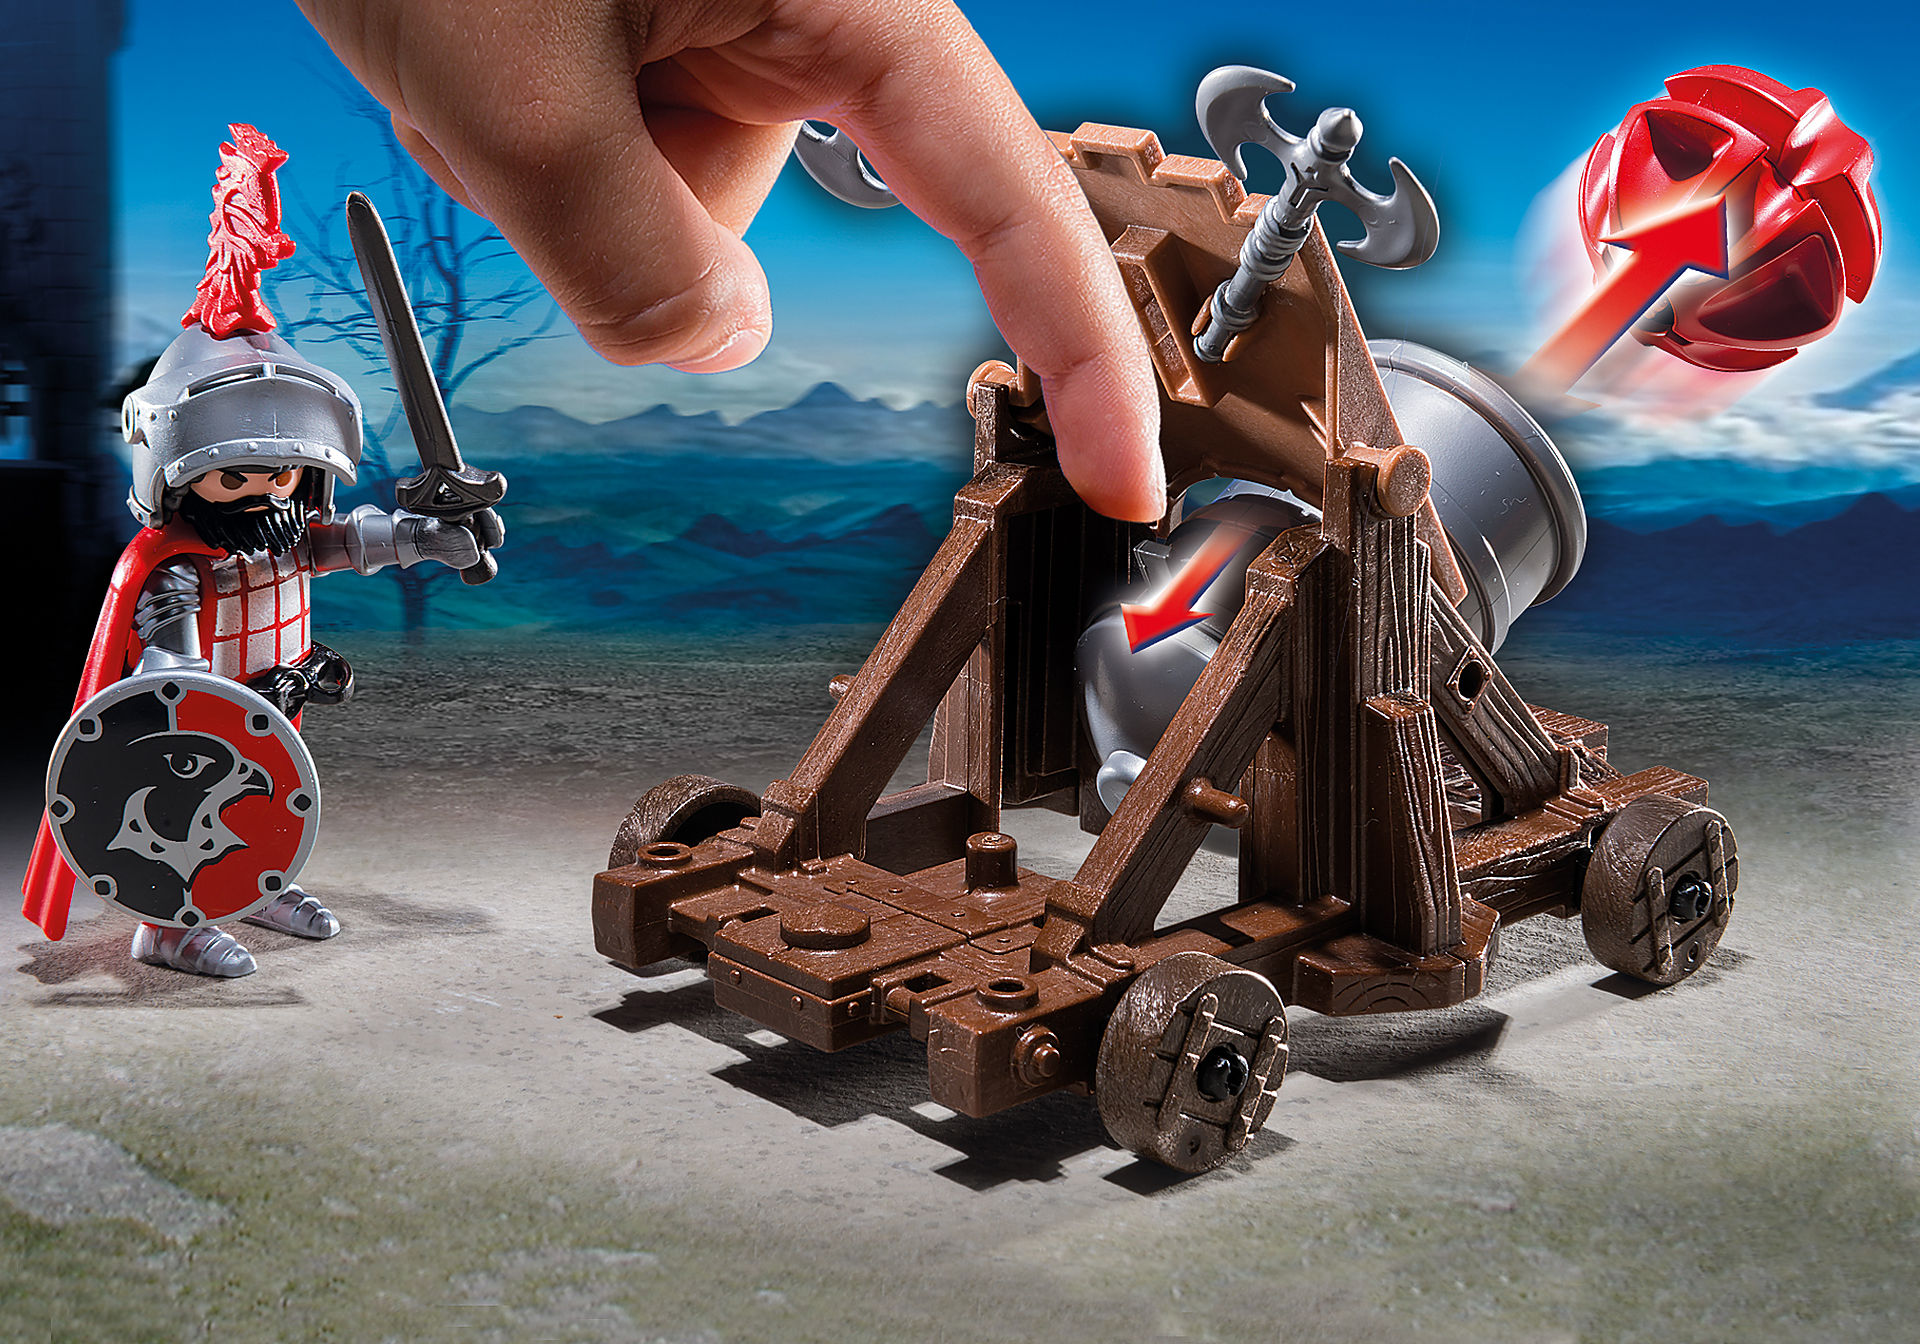 http://media.playmobil.com/i/playmobil/6038_product_extra2/Рыцари: Боевая пушка Рыцарей Сокола